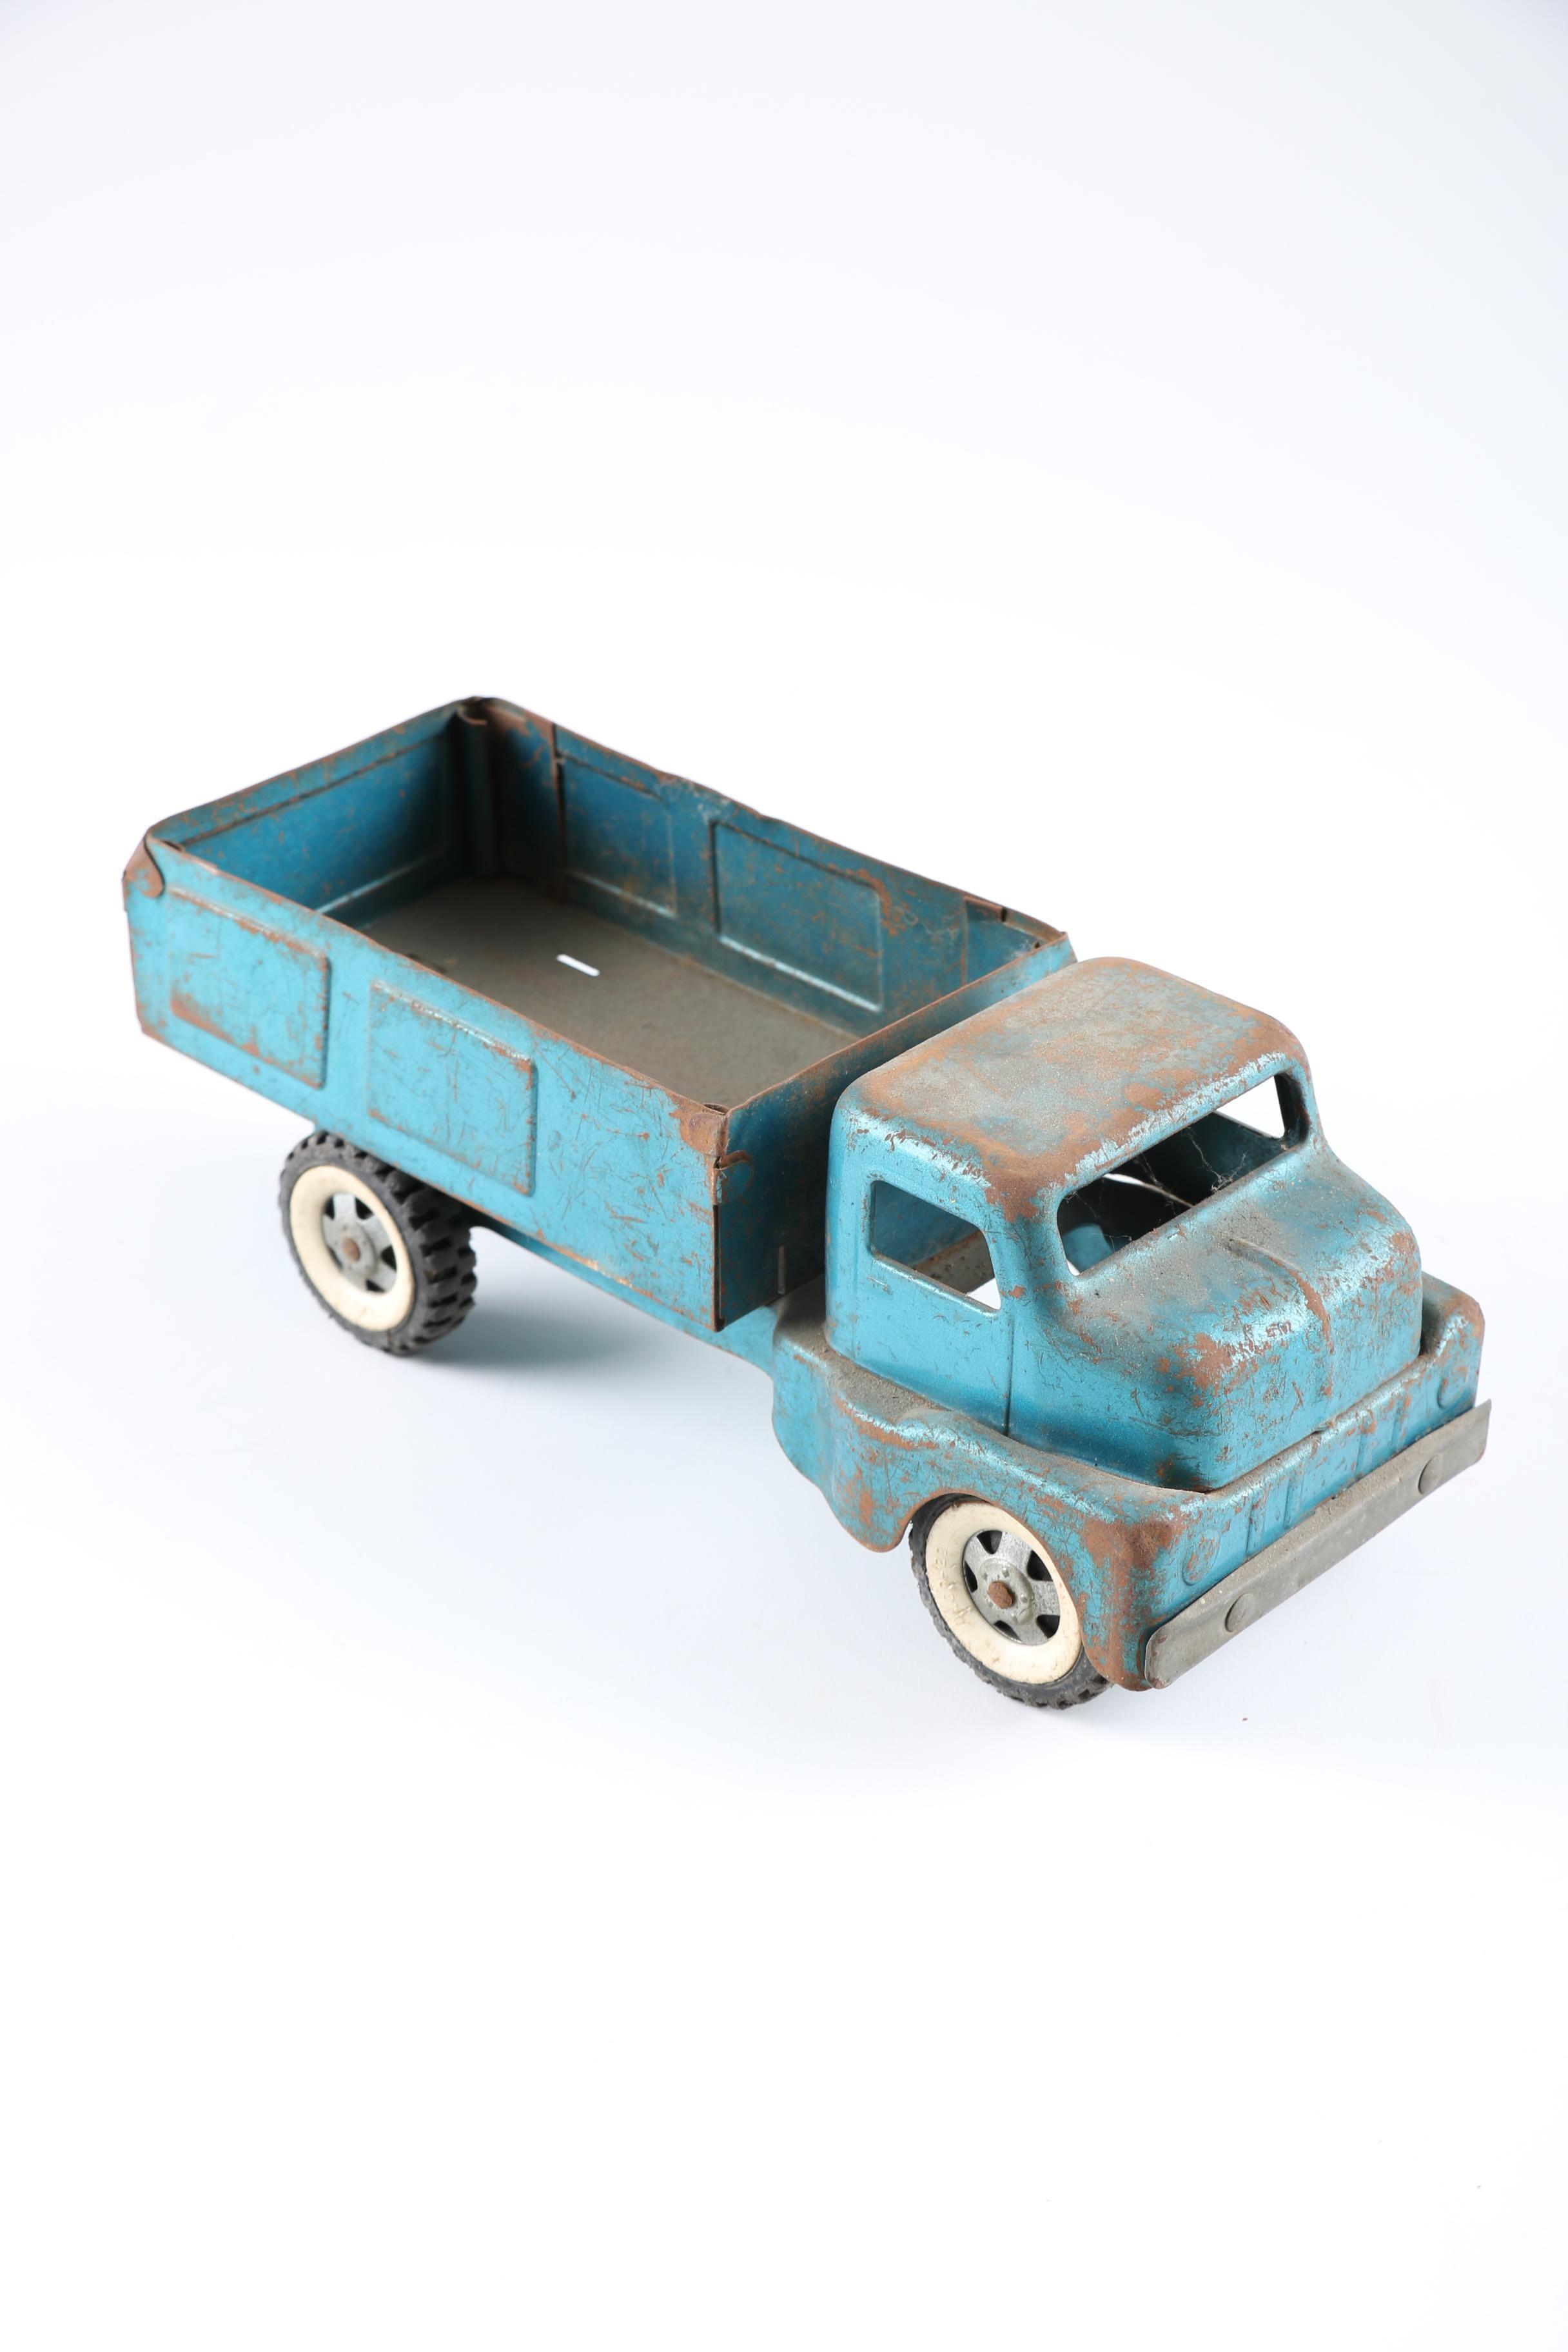 Strutco Pressed Metal Toy Dump Truck